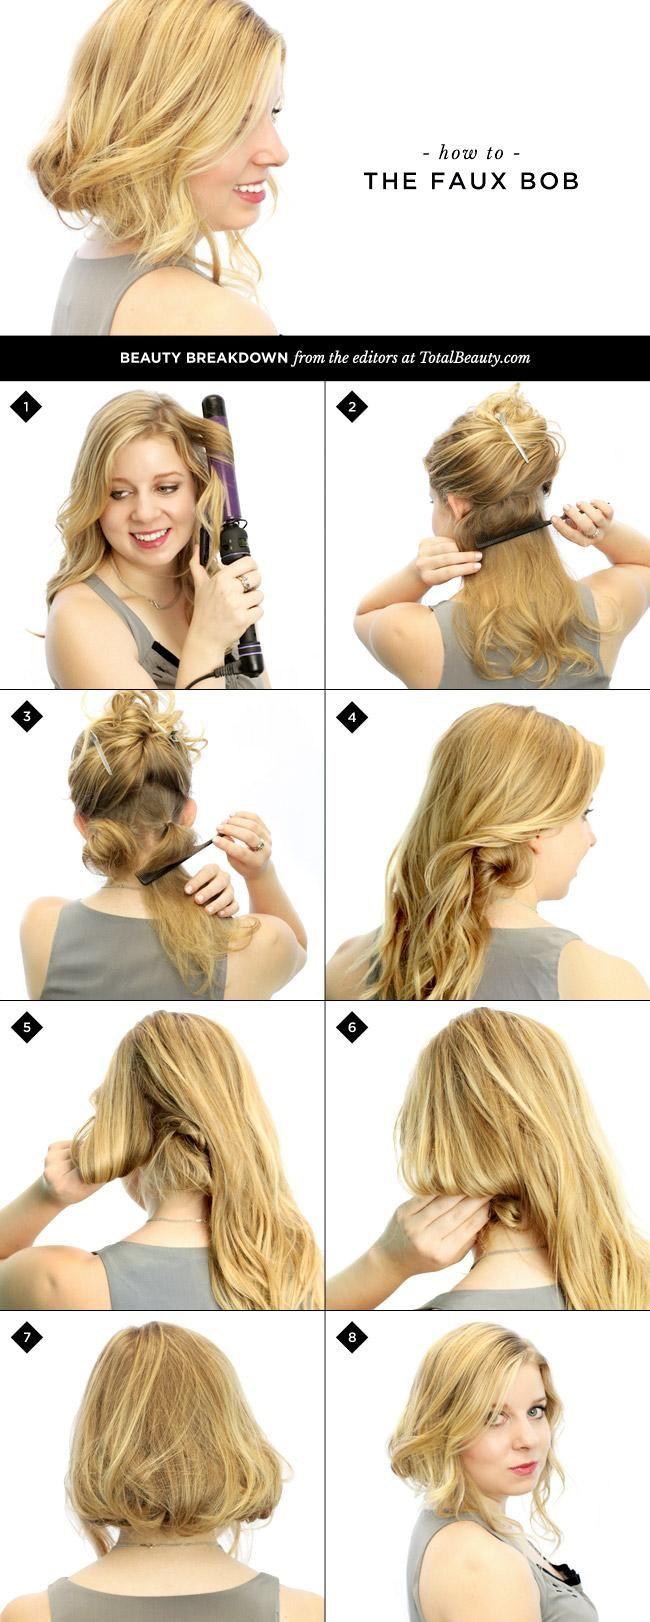 56 best DIY Wedding Hair images on Pinterest | Bridal hairstyles ...